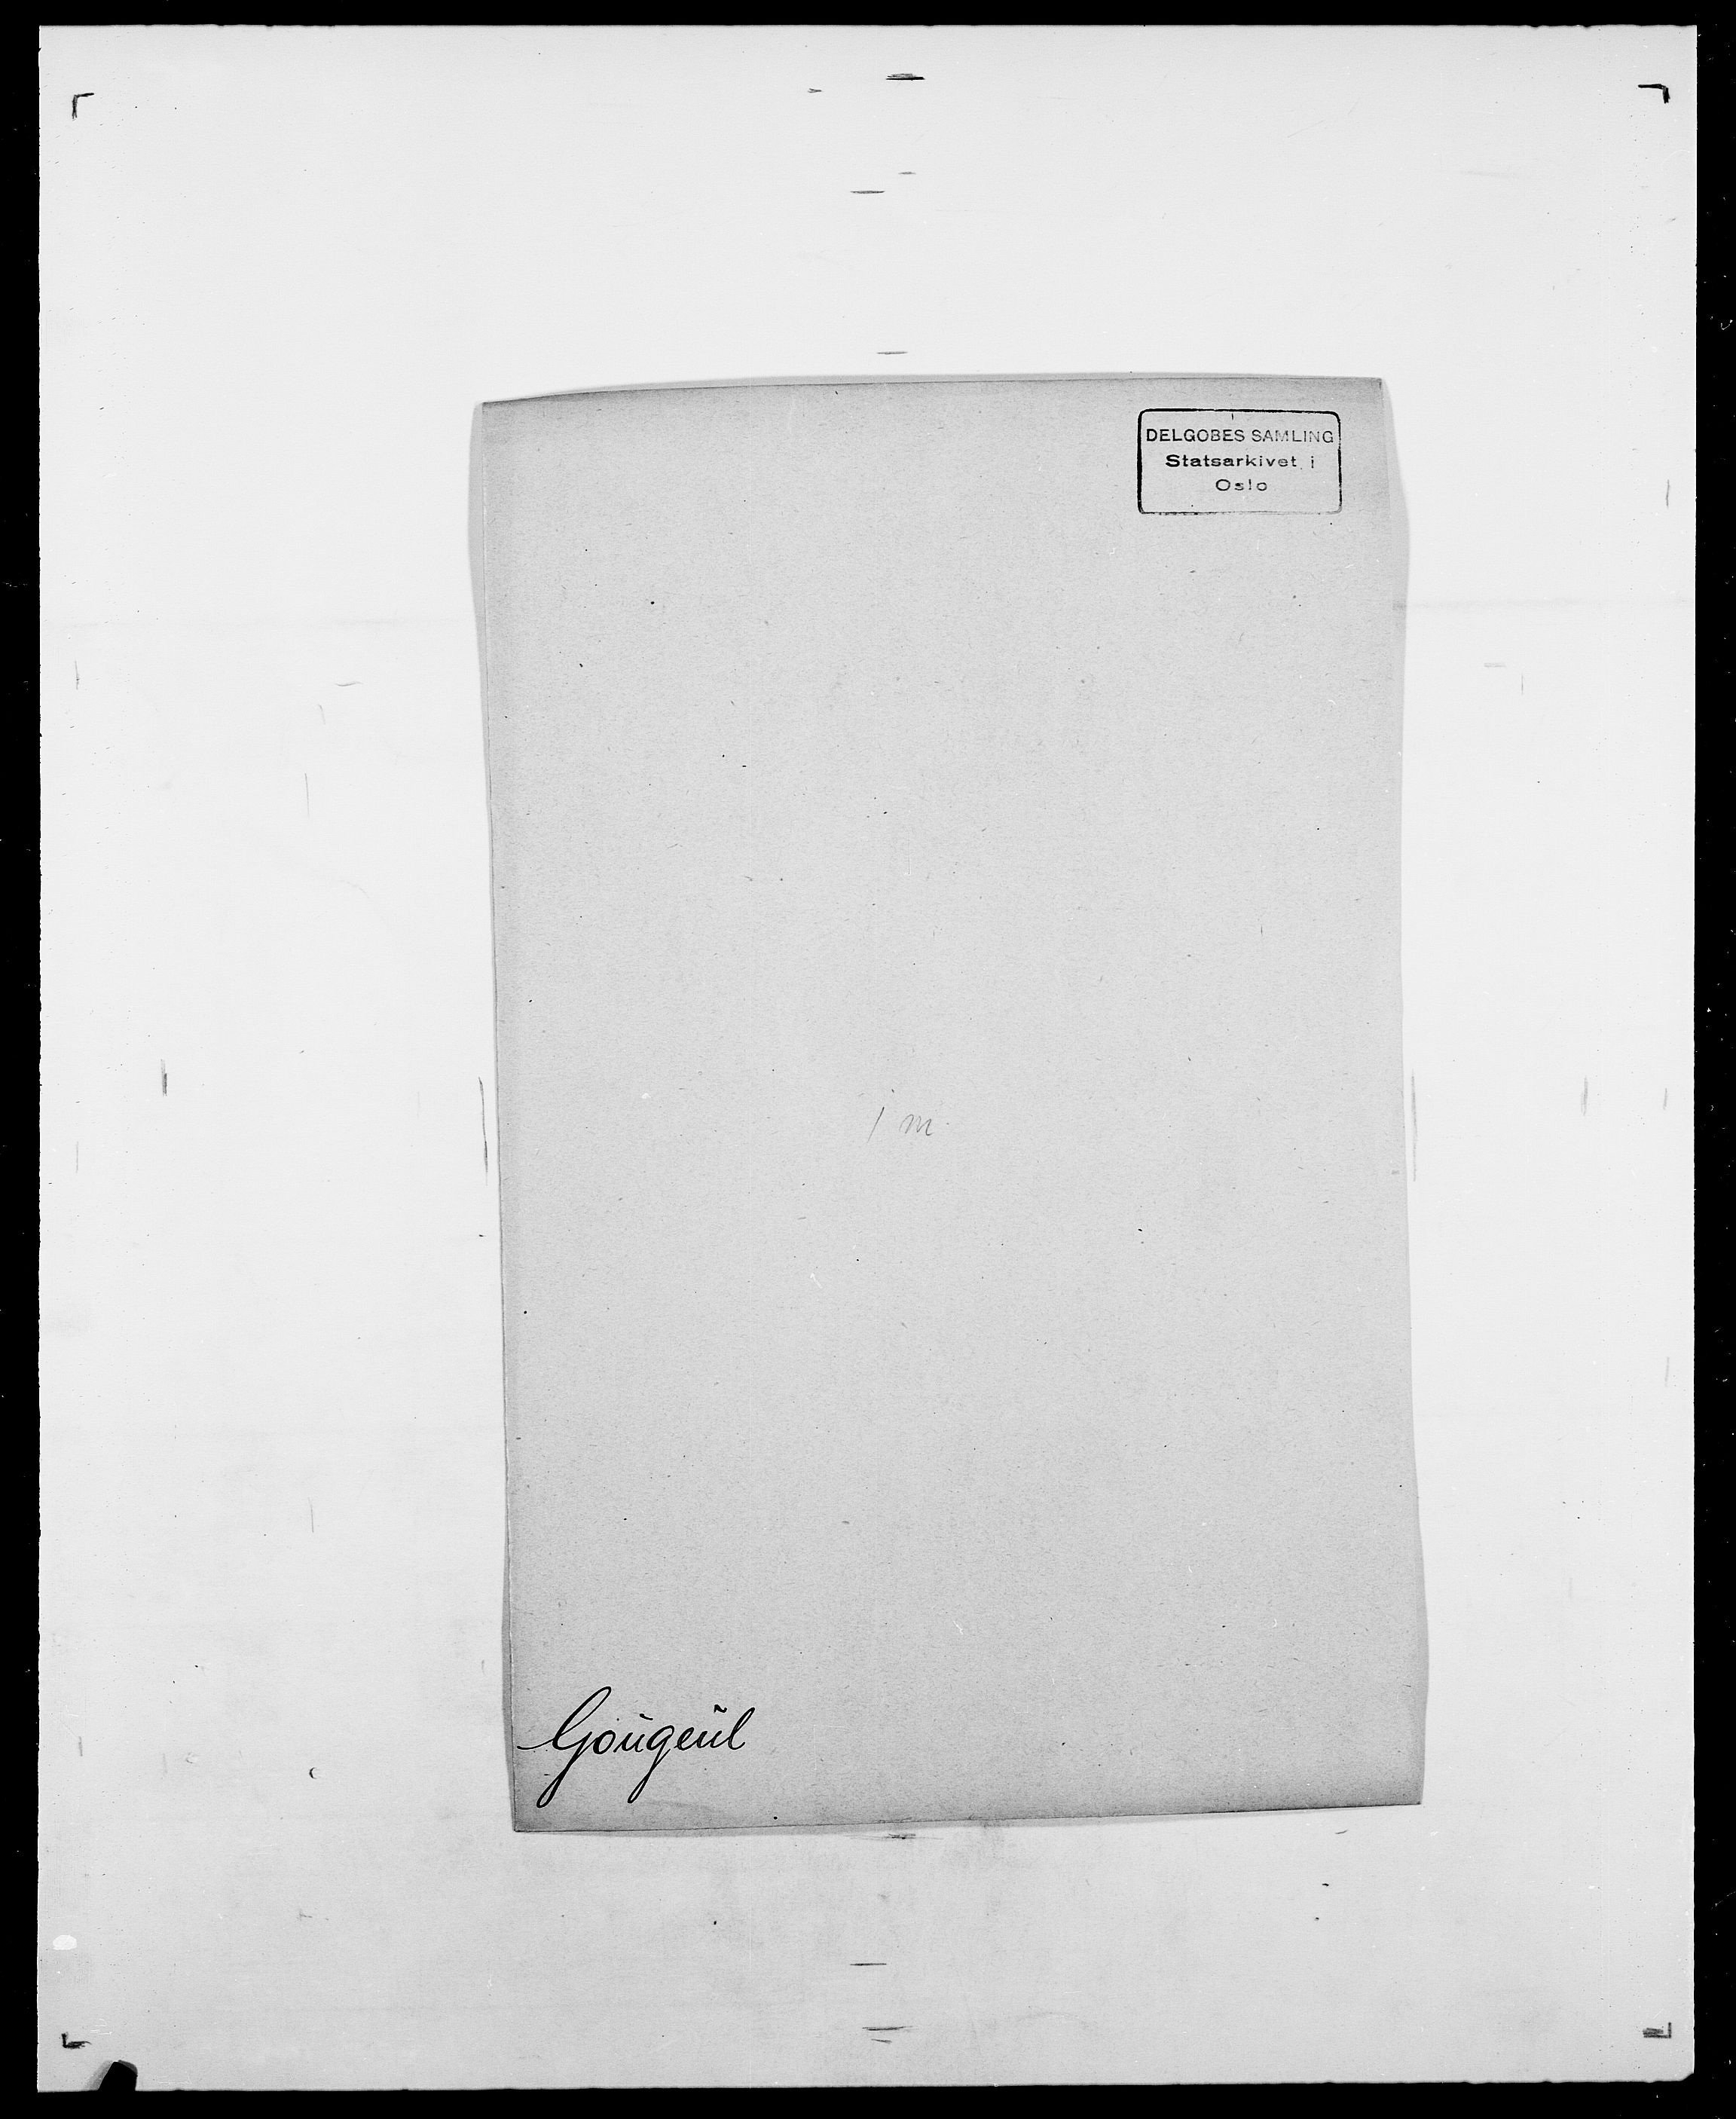 SAO, Delgobe, Charles Antoine - samling, D/Da/L0014: Giebdhausen - Grip, s. 420